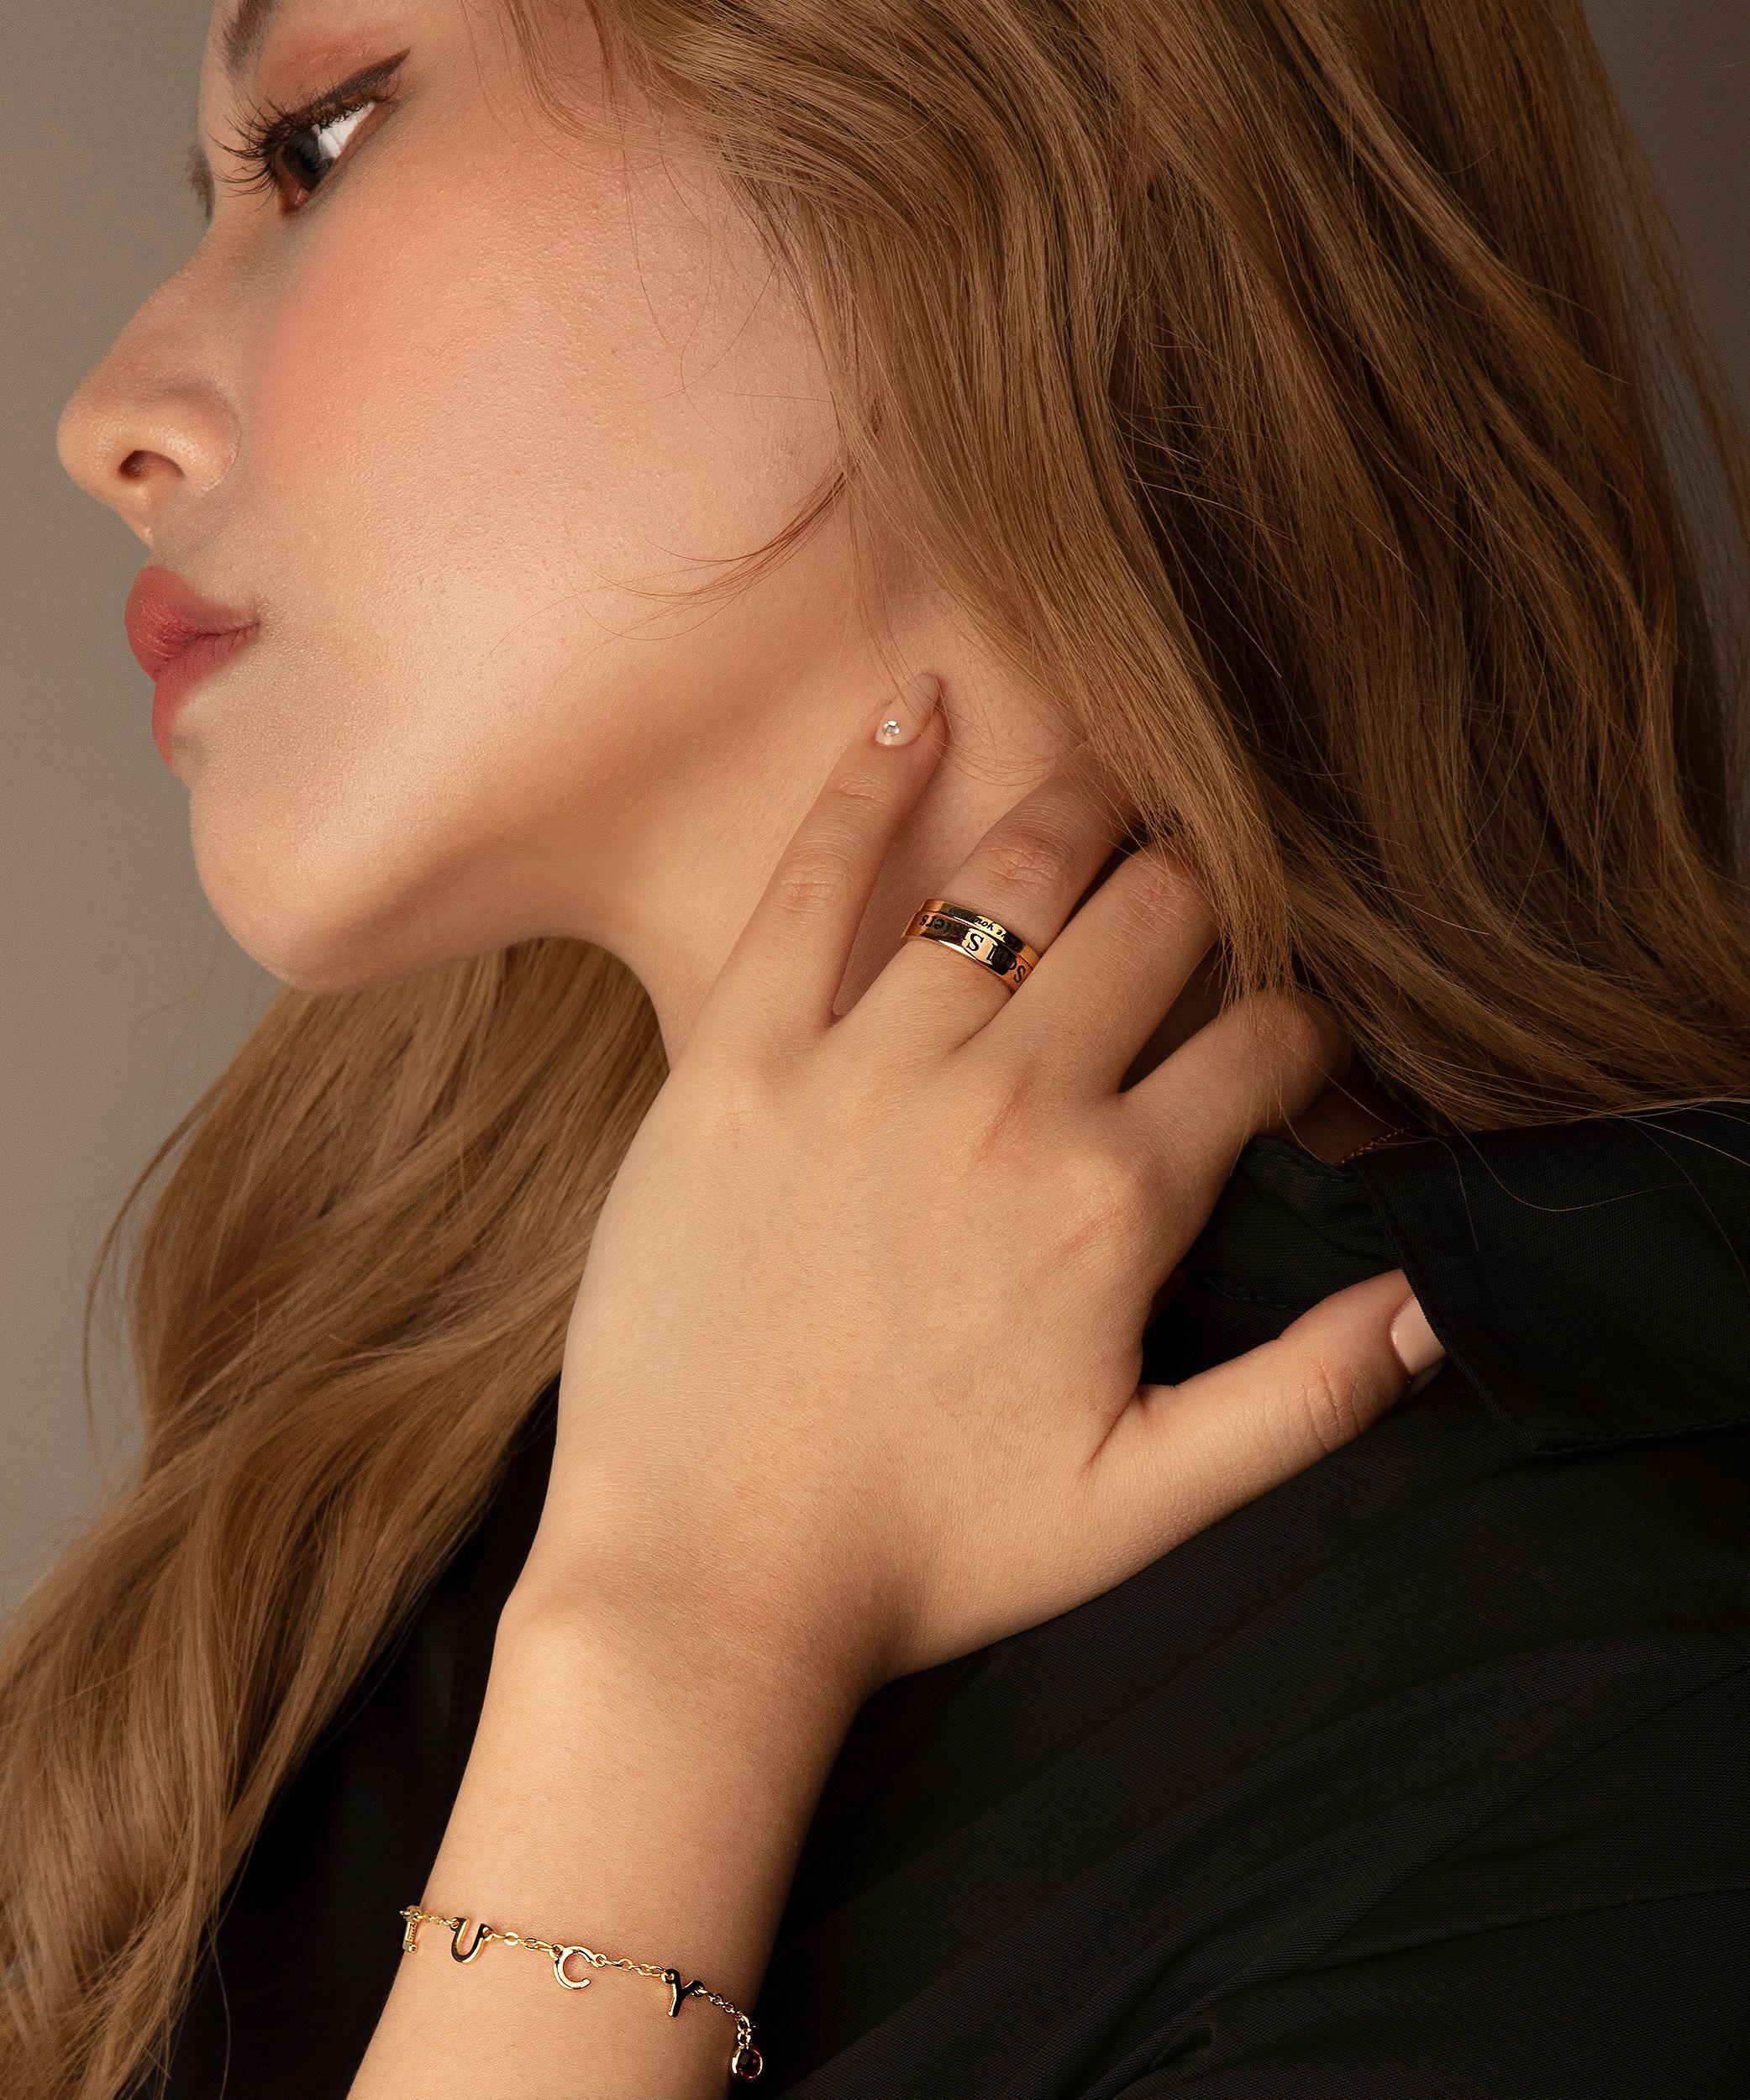 Ring For Women In 2020 Friend Rings Coordinate Rings Engraved Rings